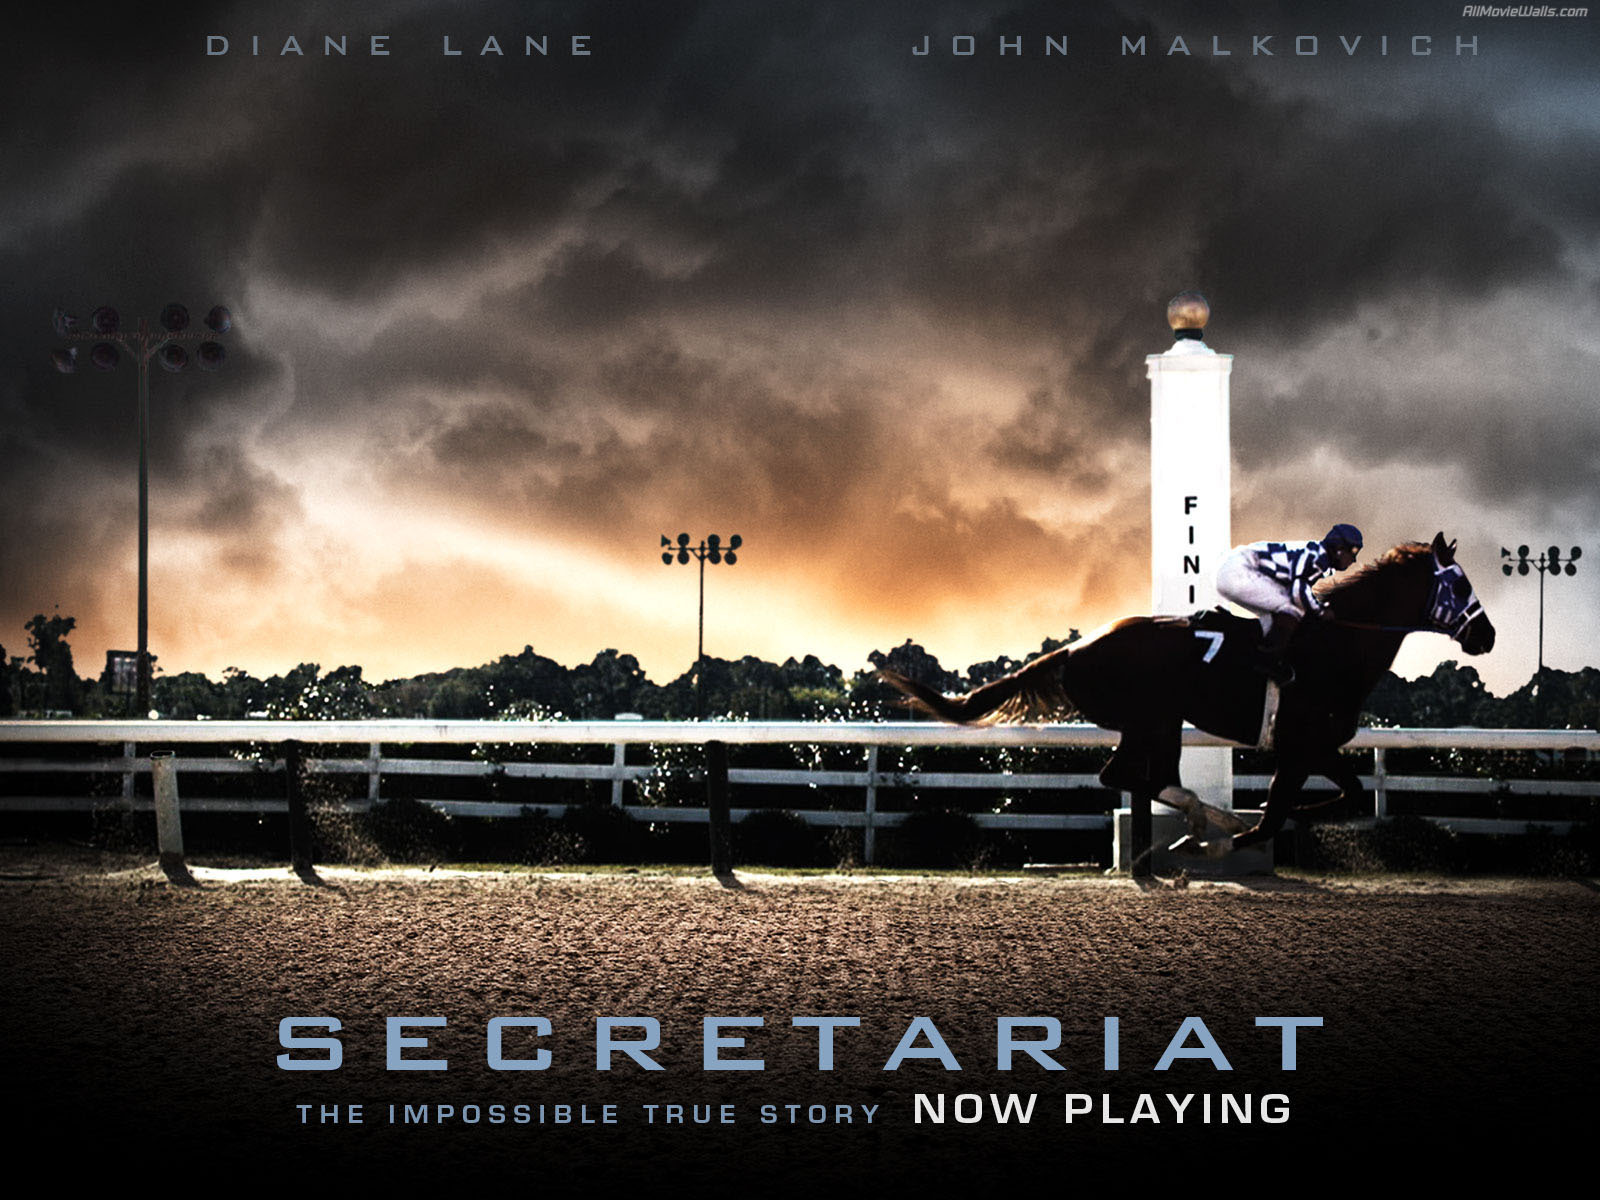 secretariat wallpaper - photo #21